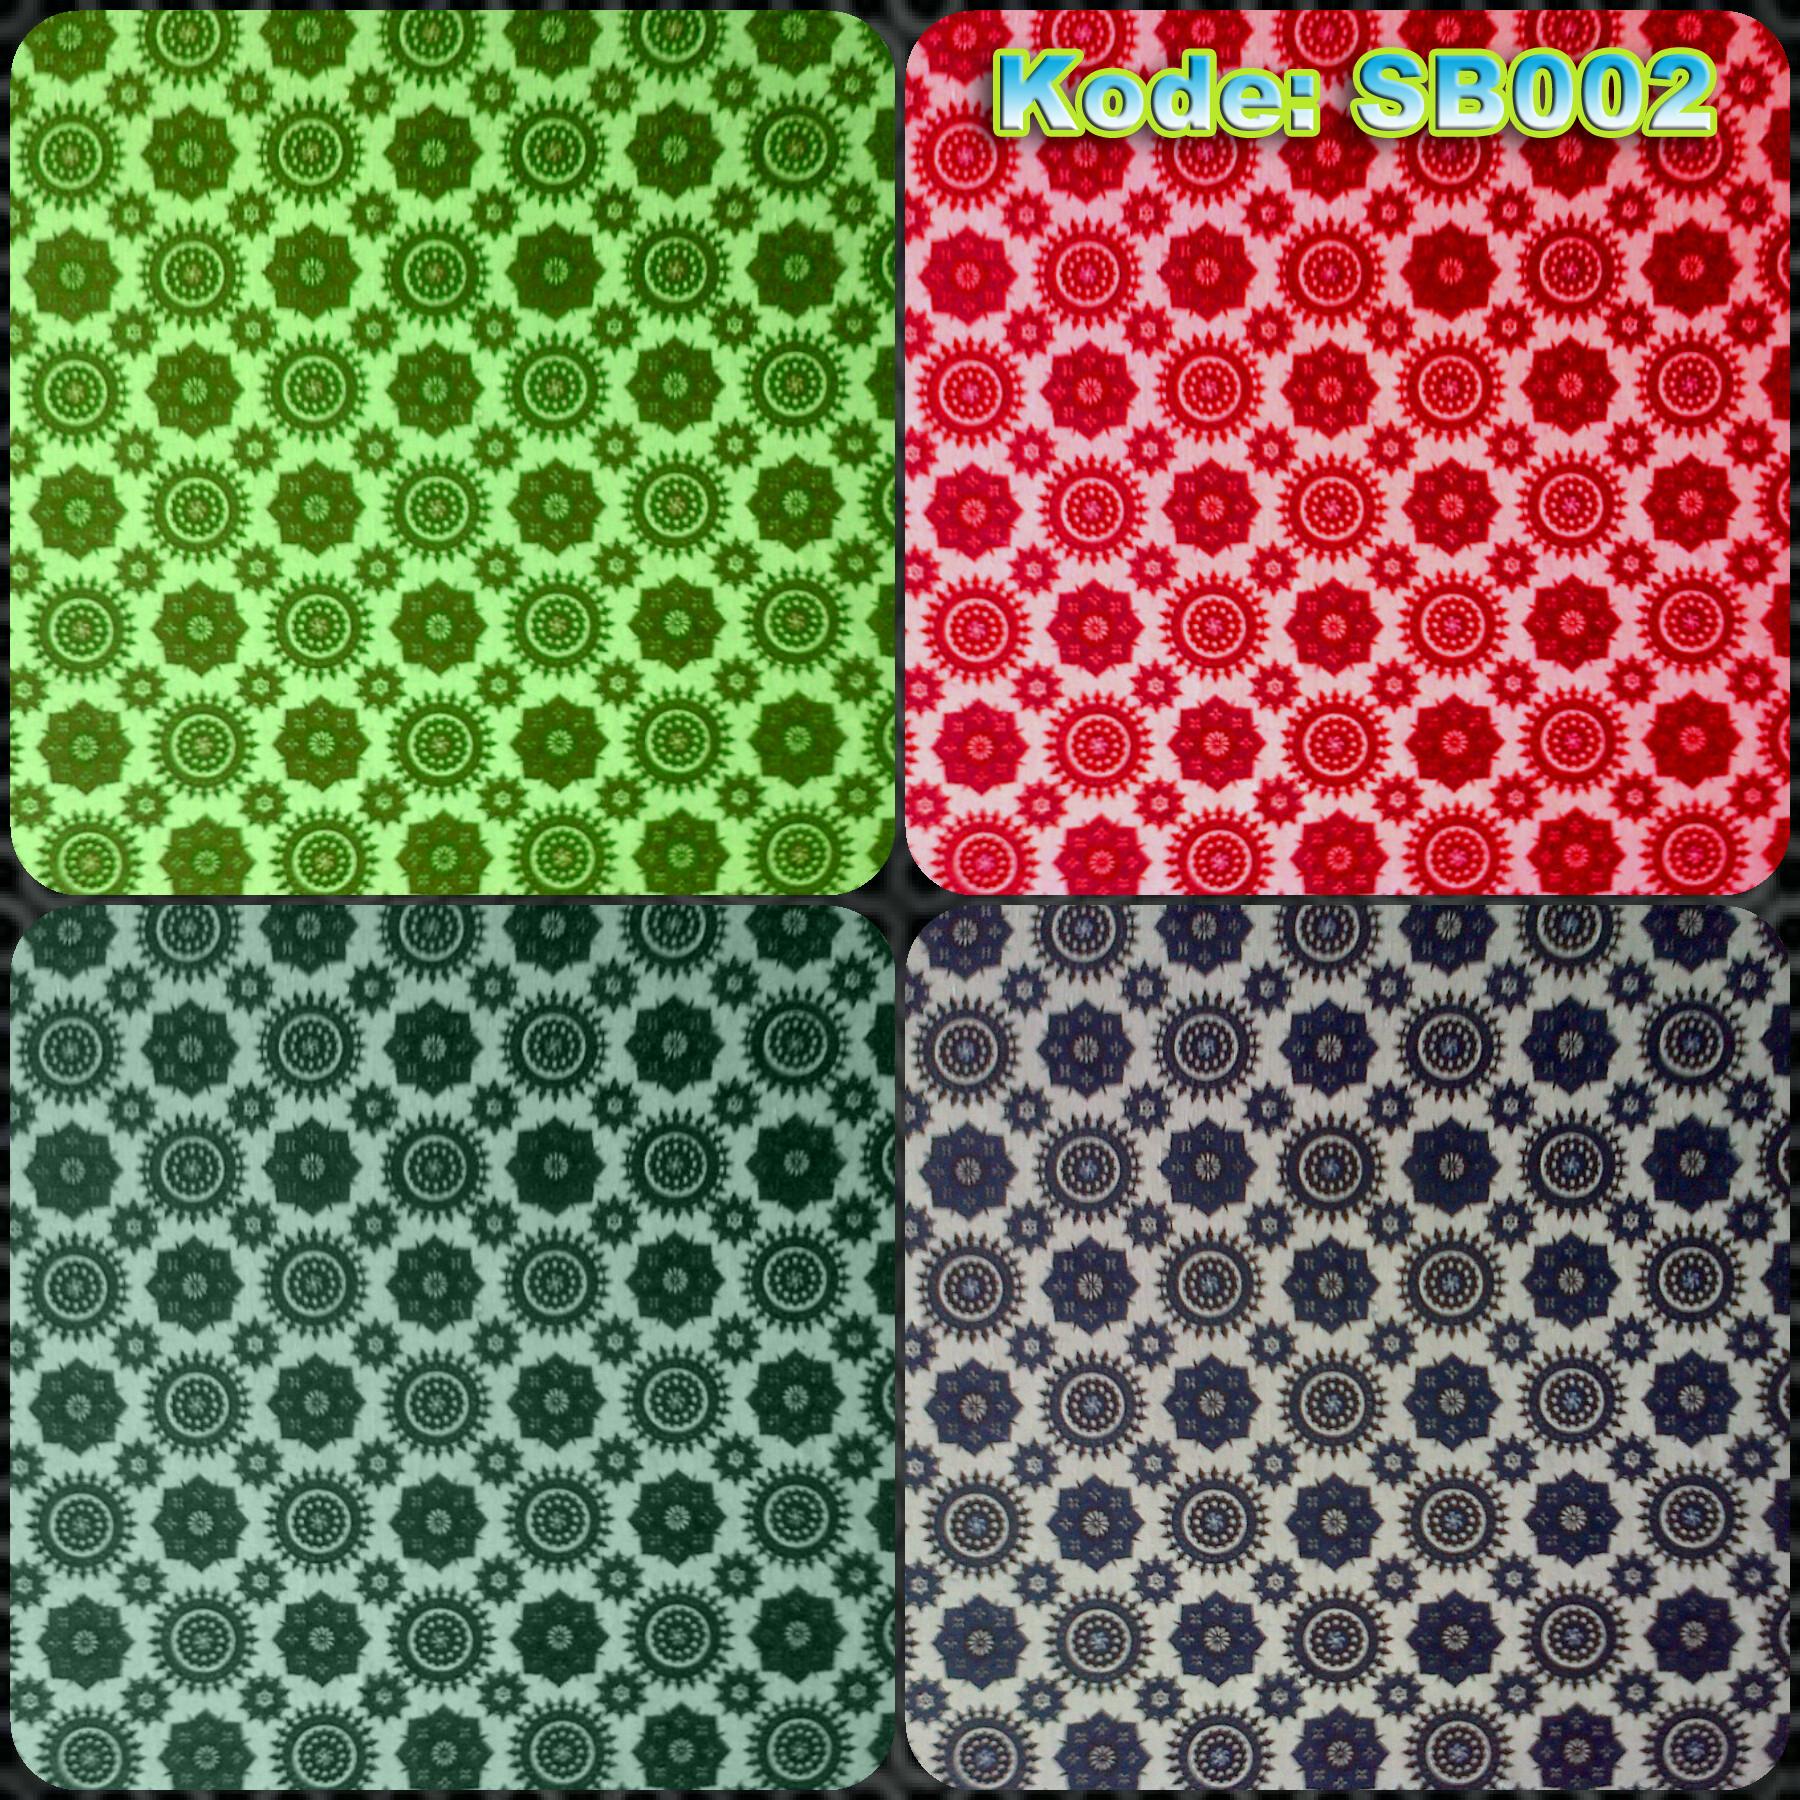 Produsen Baju Seragam Batik Sekolah Produsen Seragam Batik Baju